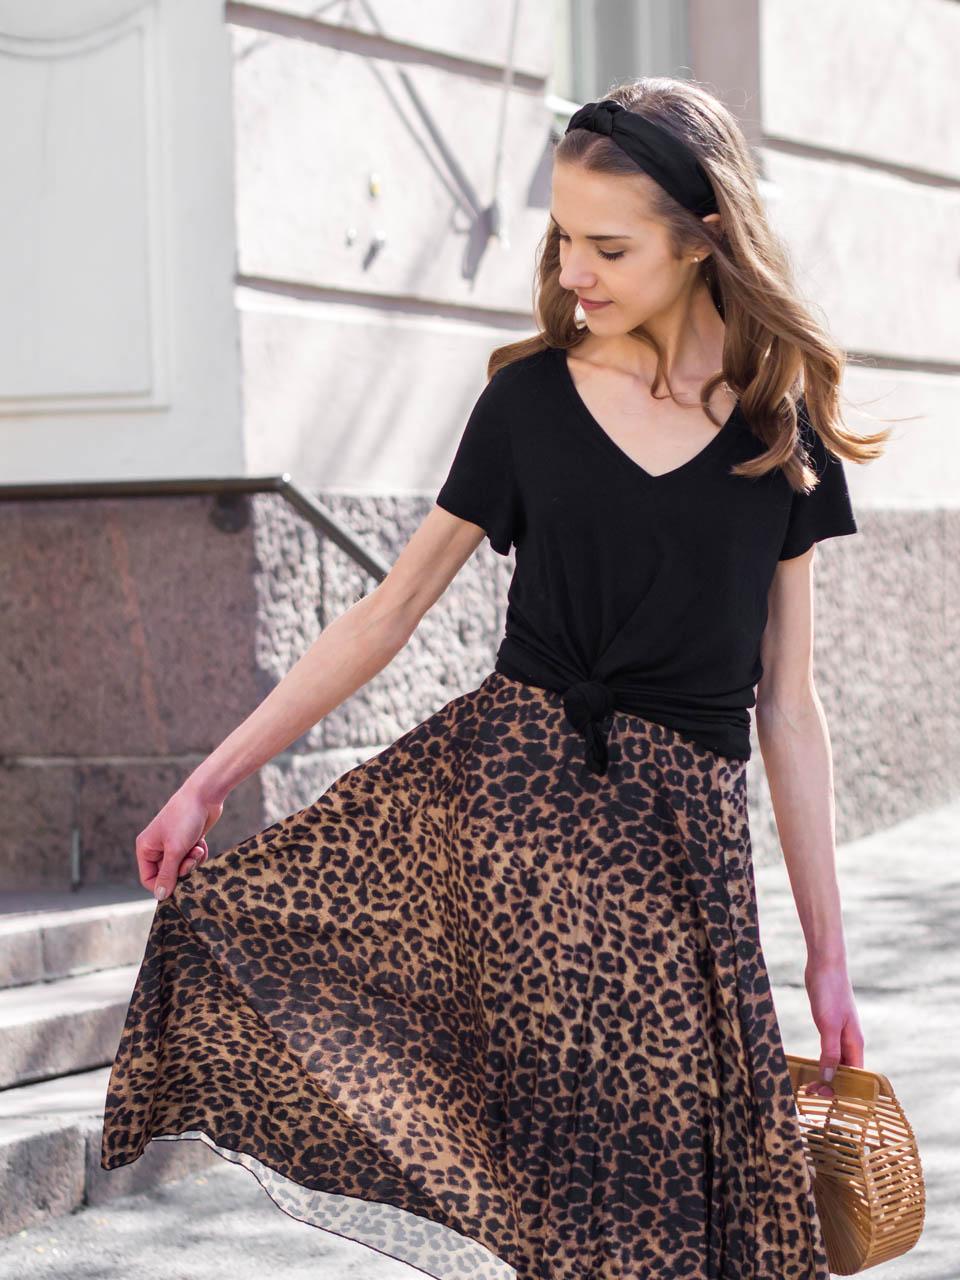 fashion-blogger-summer-outfit-leopard-midi-skirt-headband-cult-gaia-ark